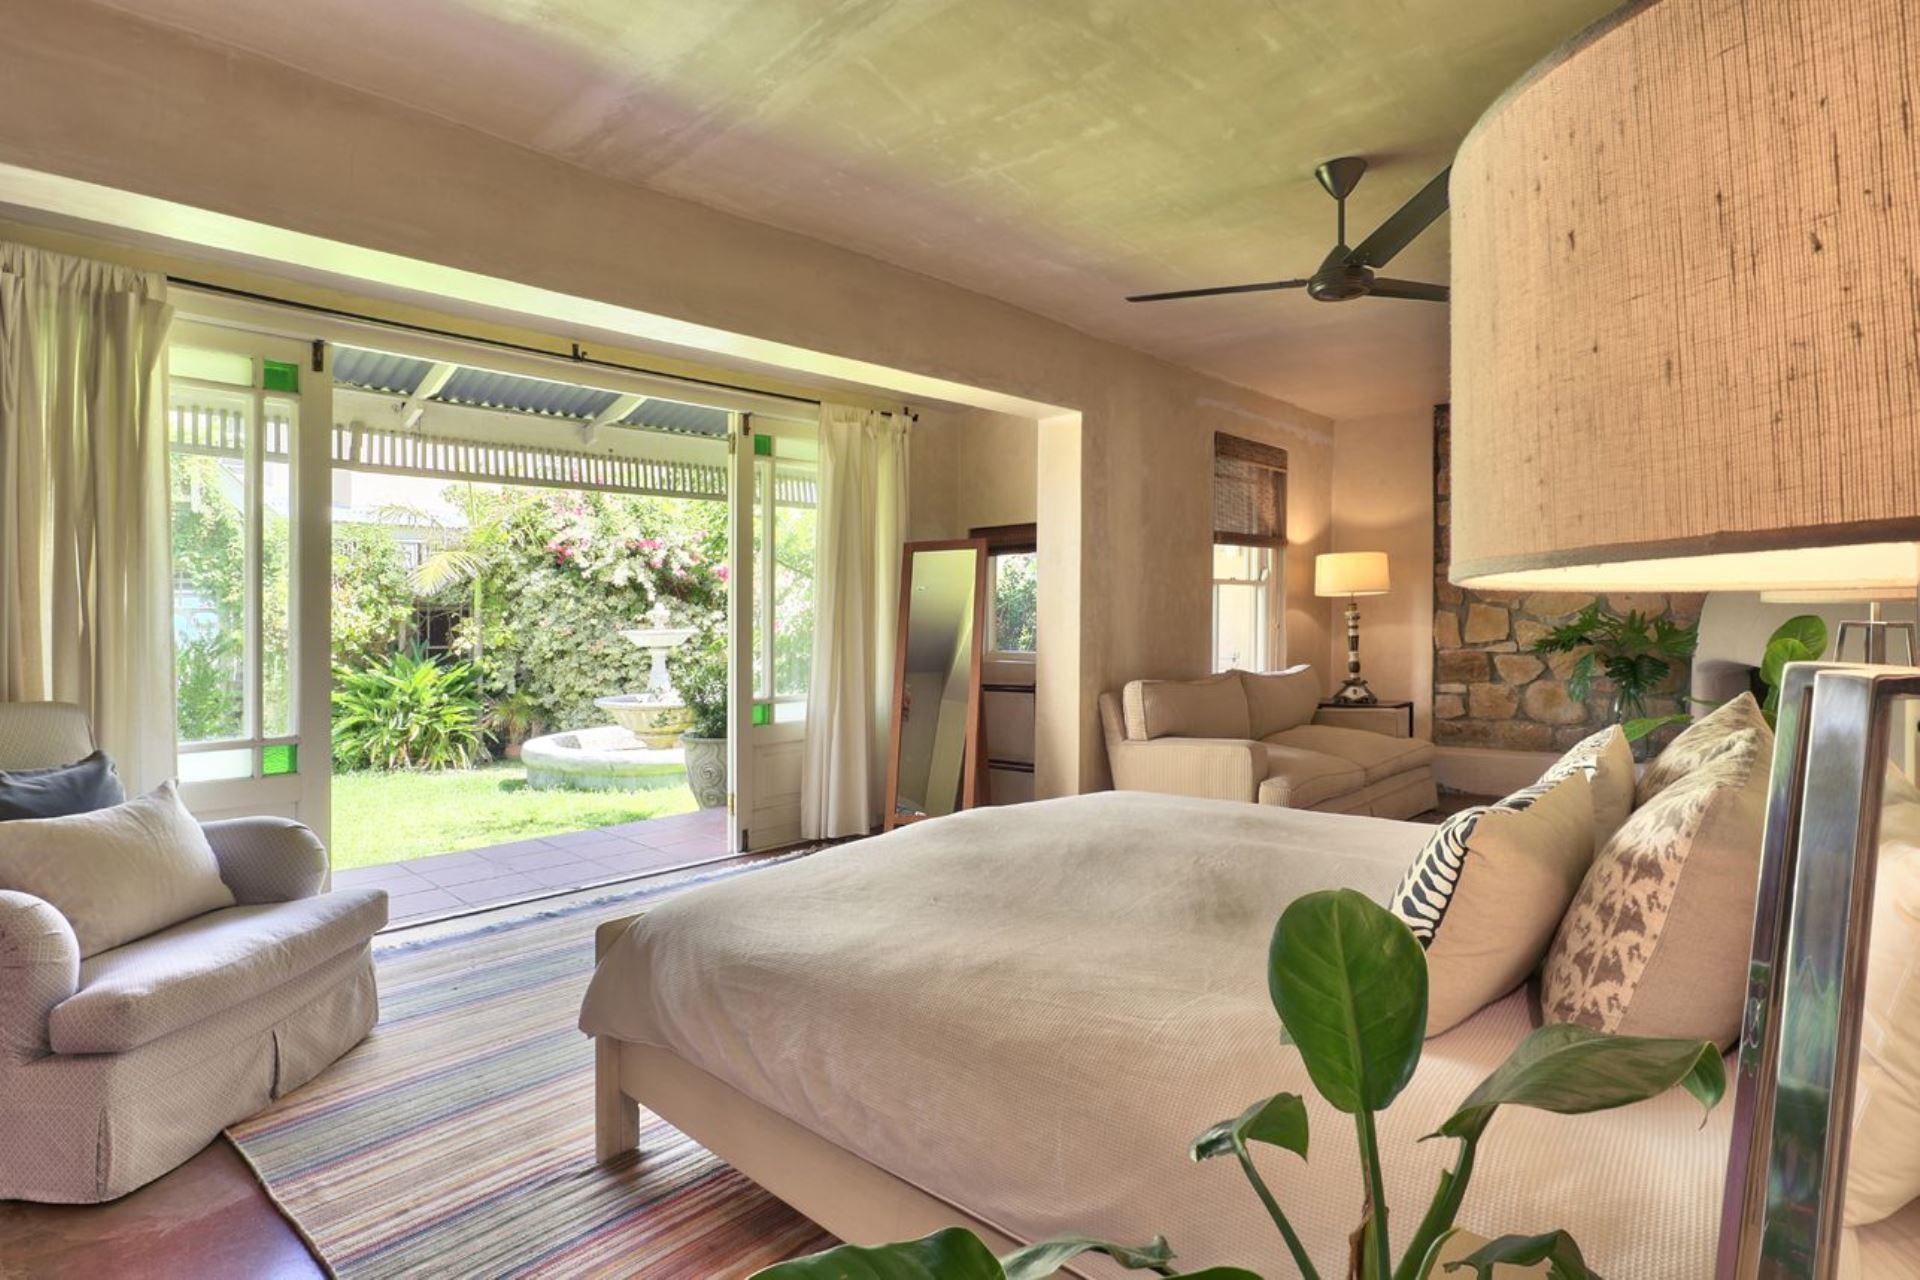 5 Bedroom House For Sale in Tierboskloof